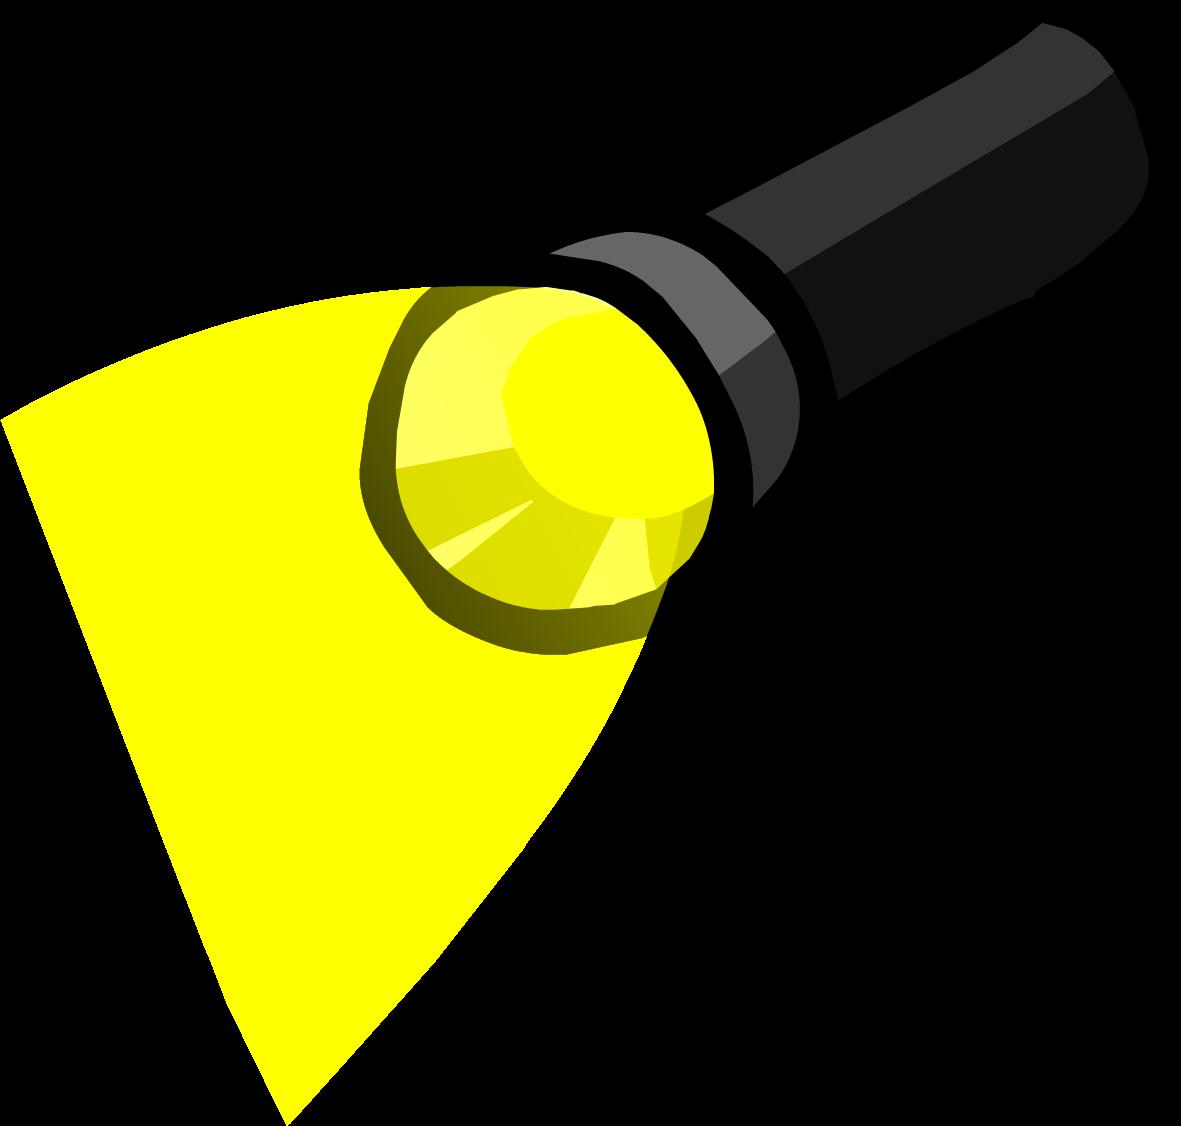 Club penguin wiki fandom. Lamp clipart flashlight